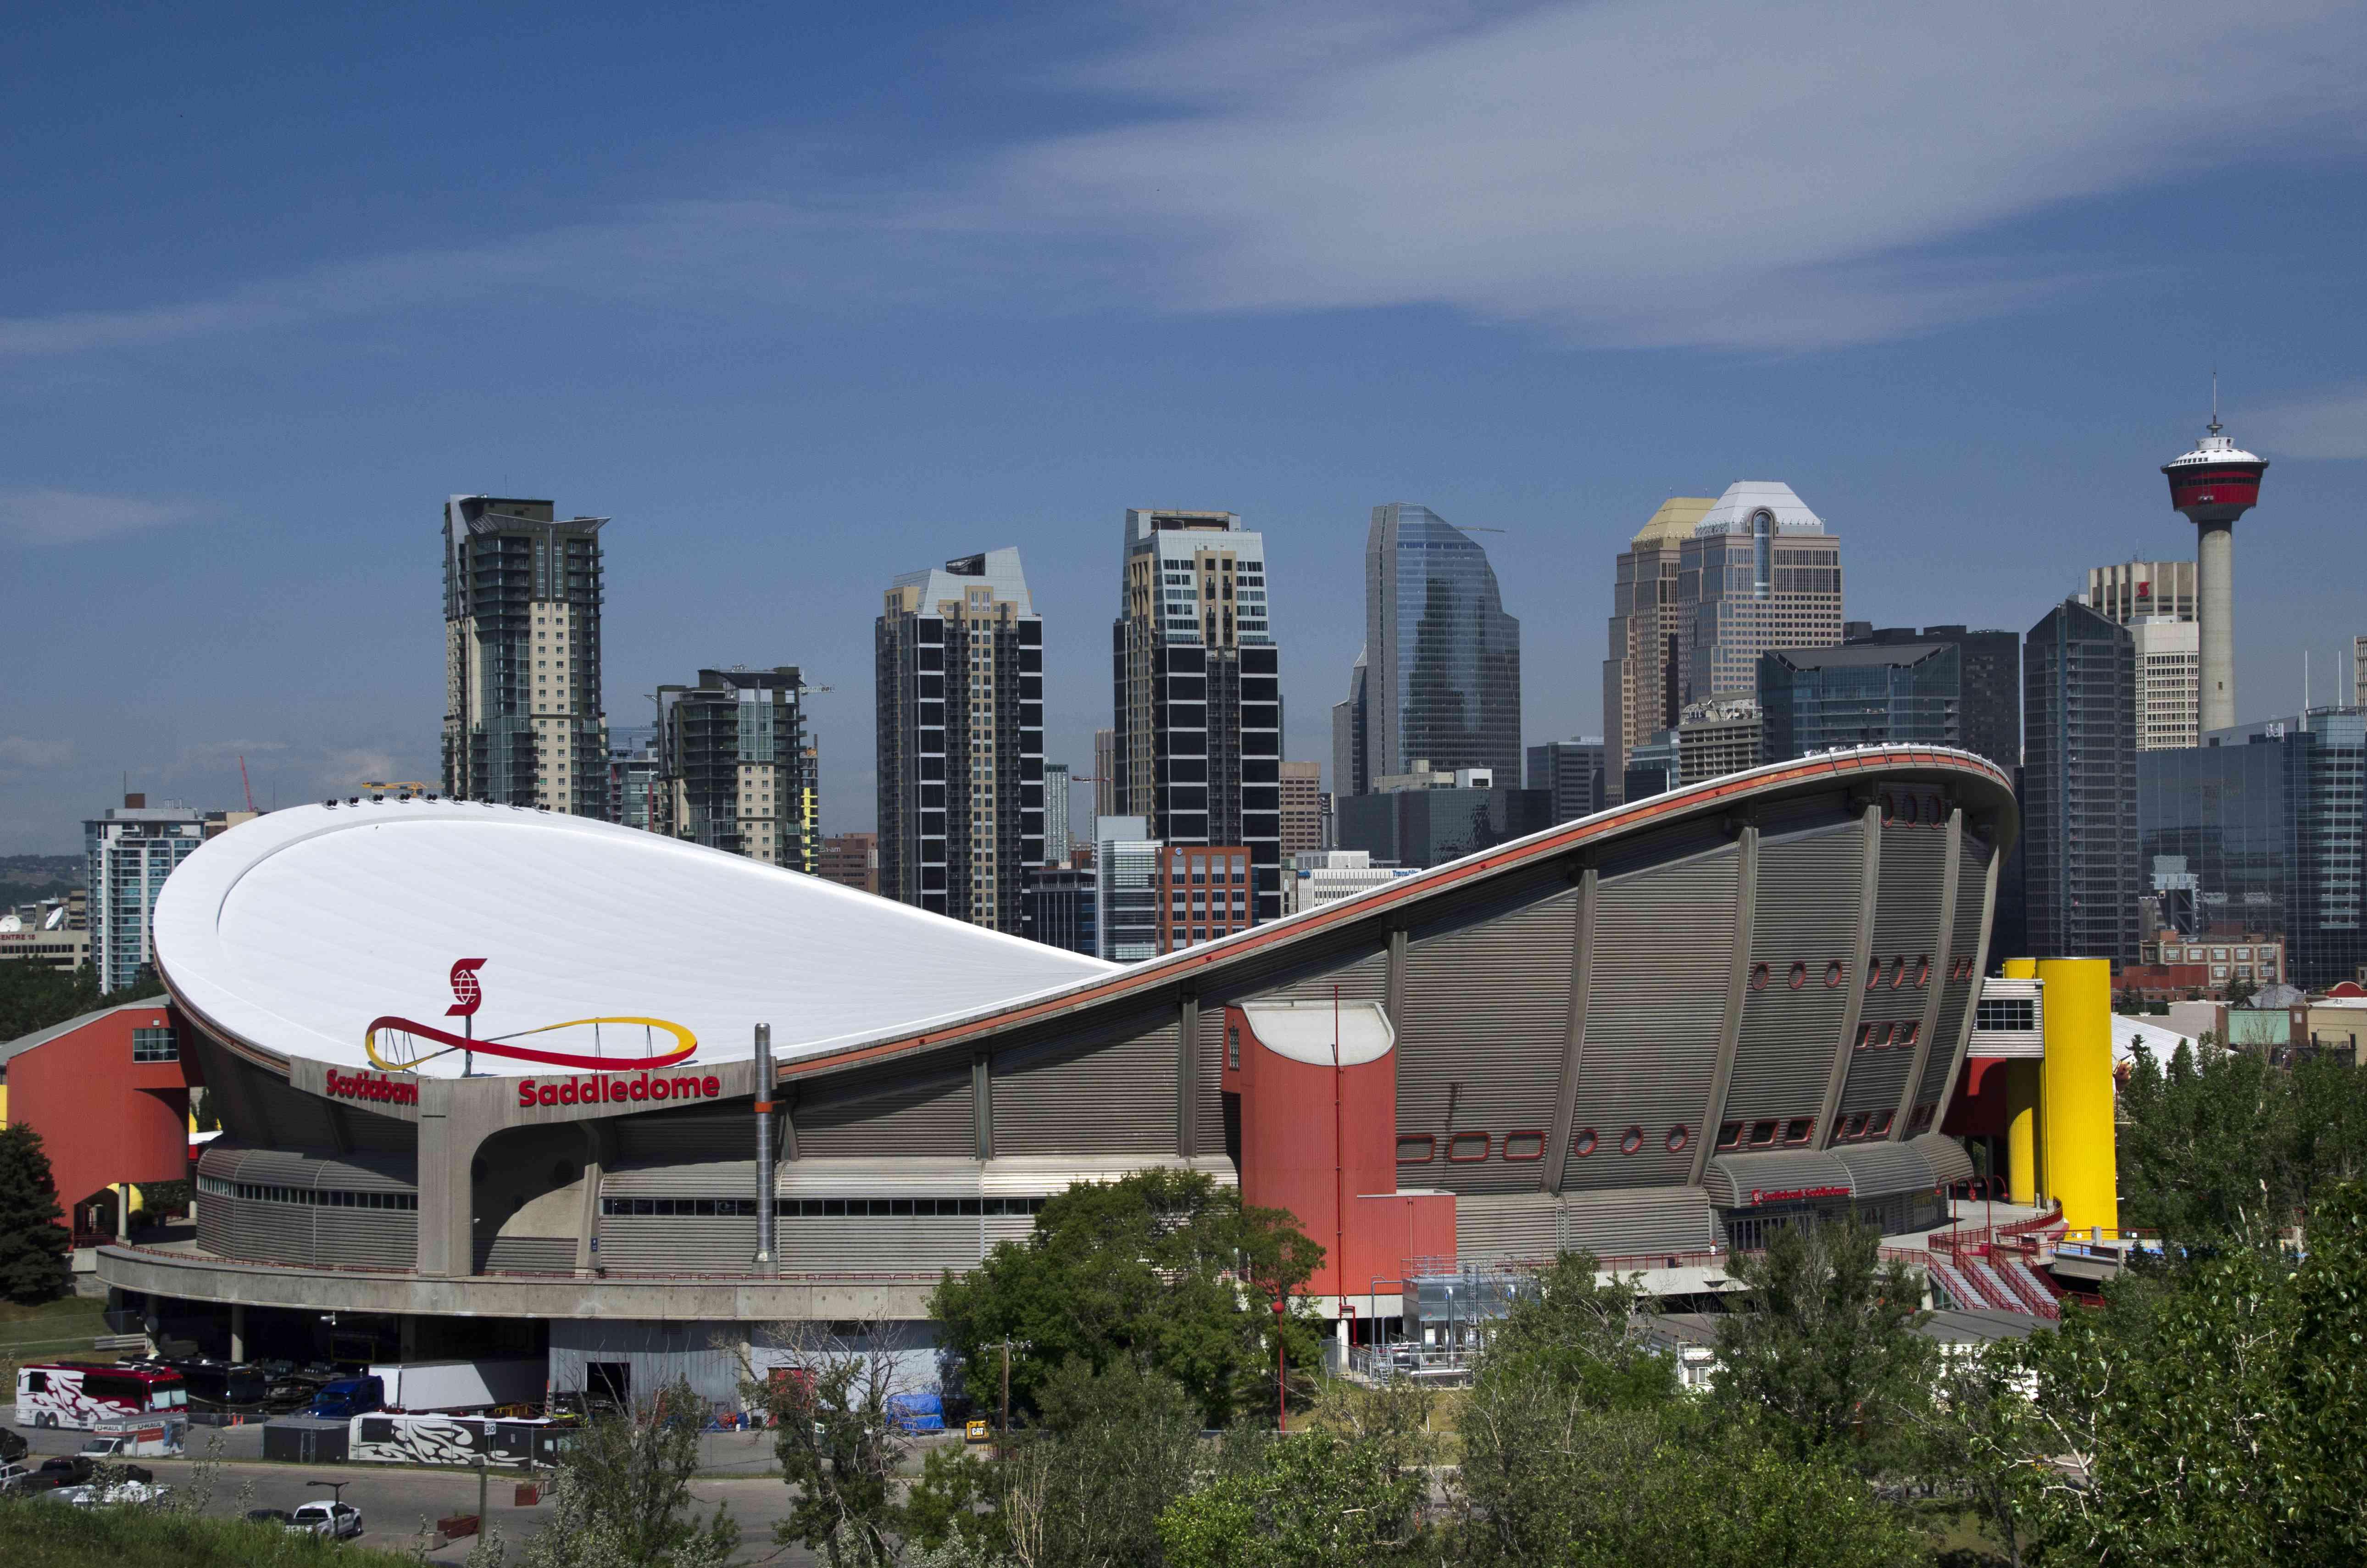 Saddledome Stadium in Calgary